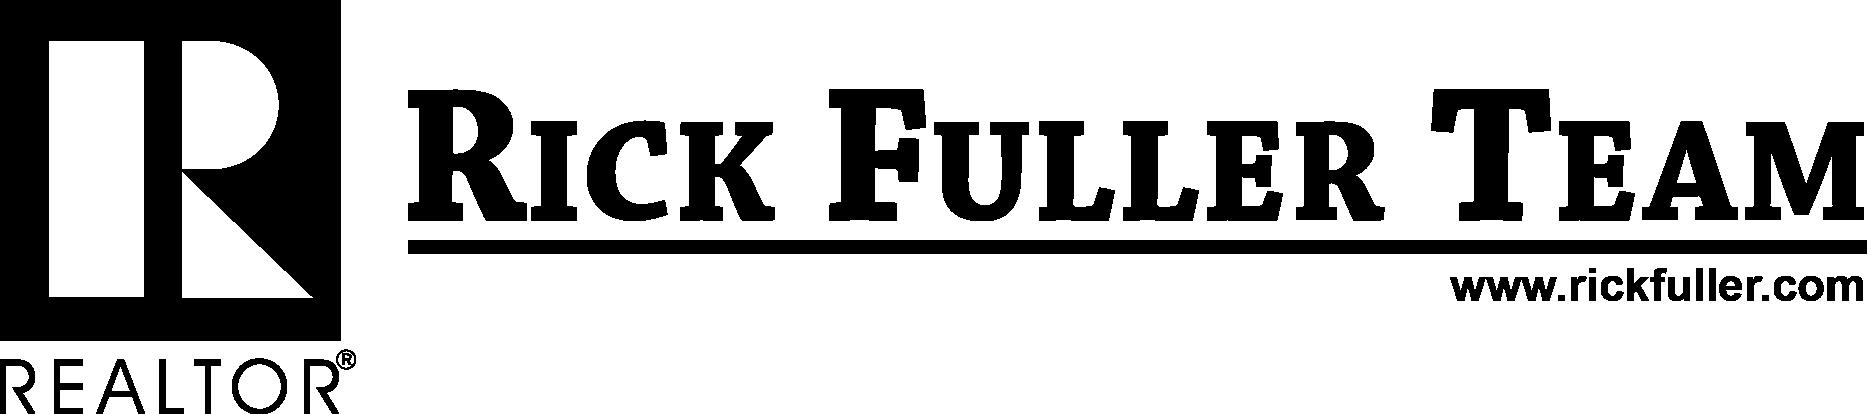 Rick-Fuller-Team-Logo